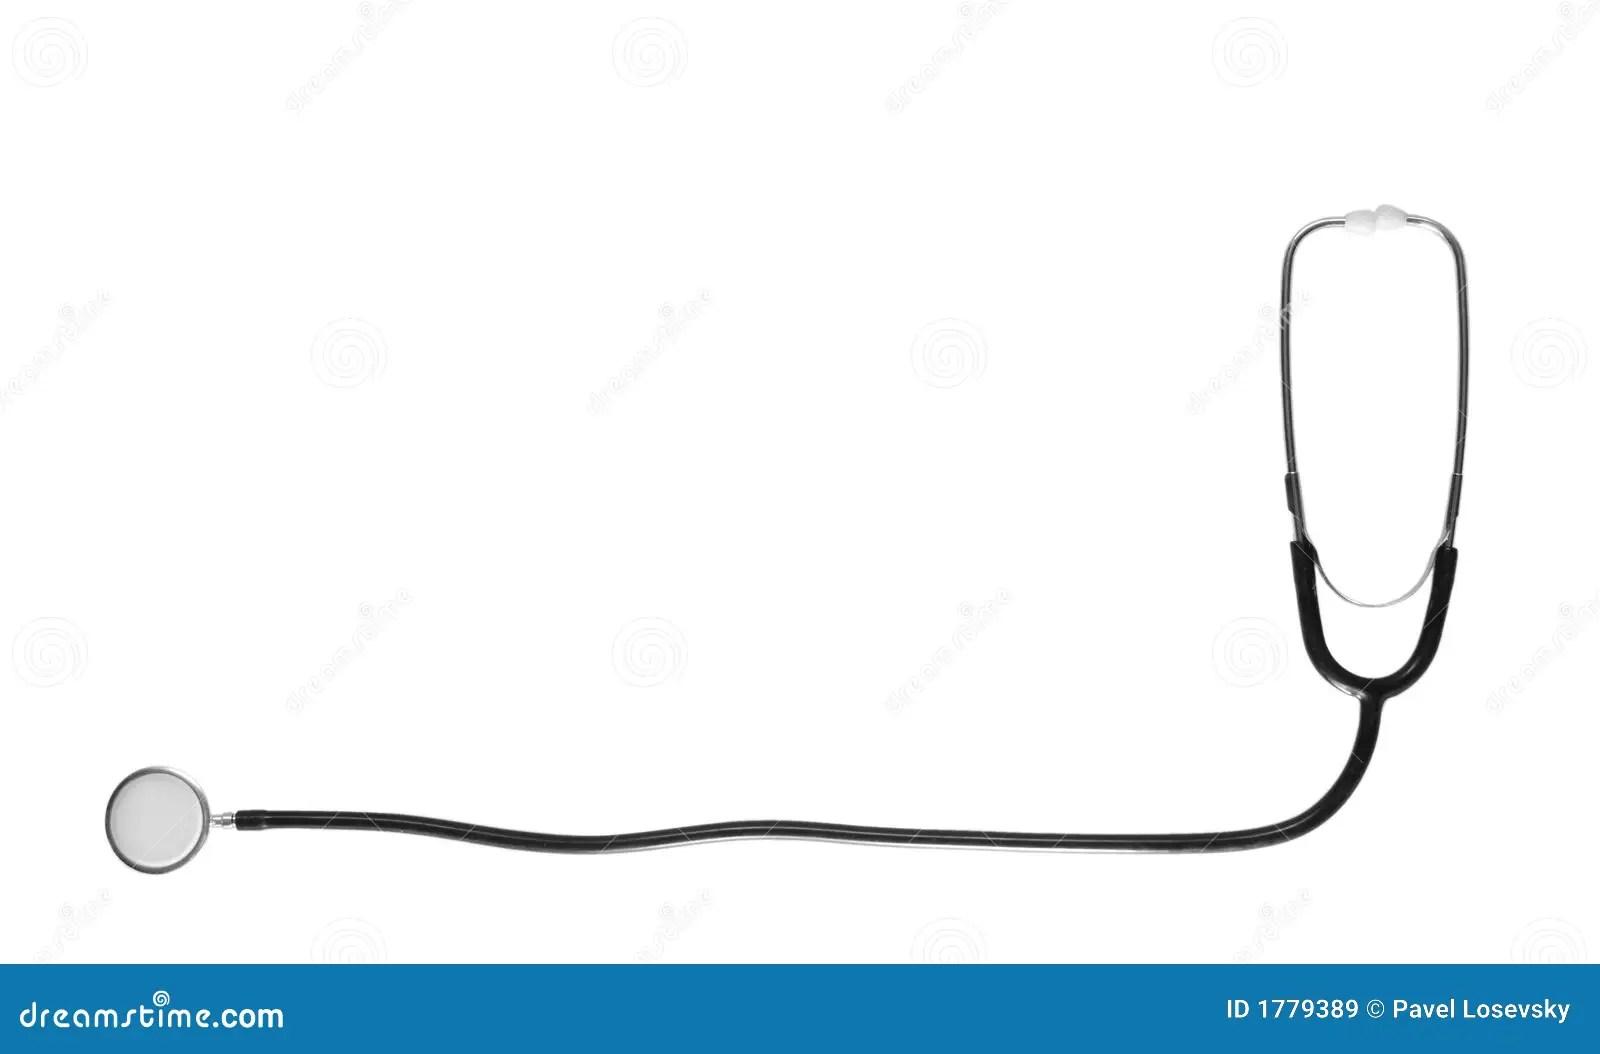 Stethoscope Royalty Free Stock Images